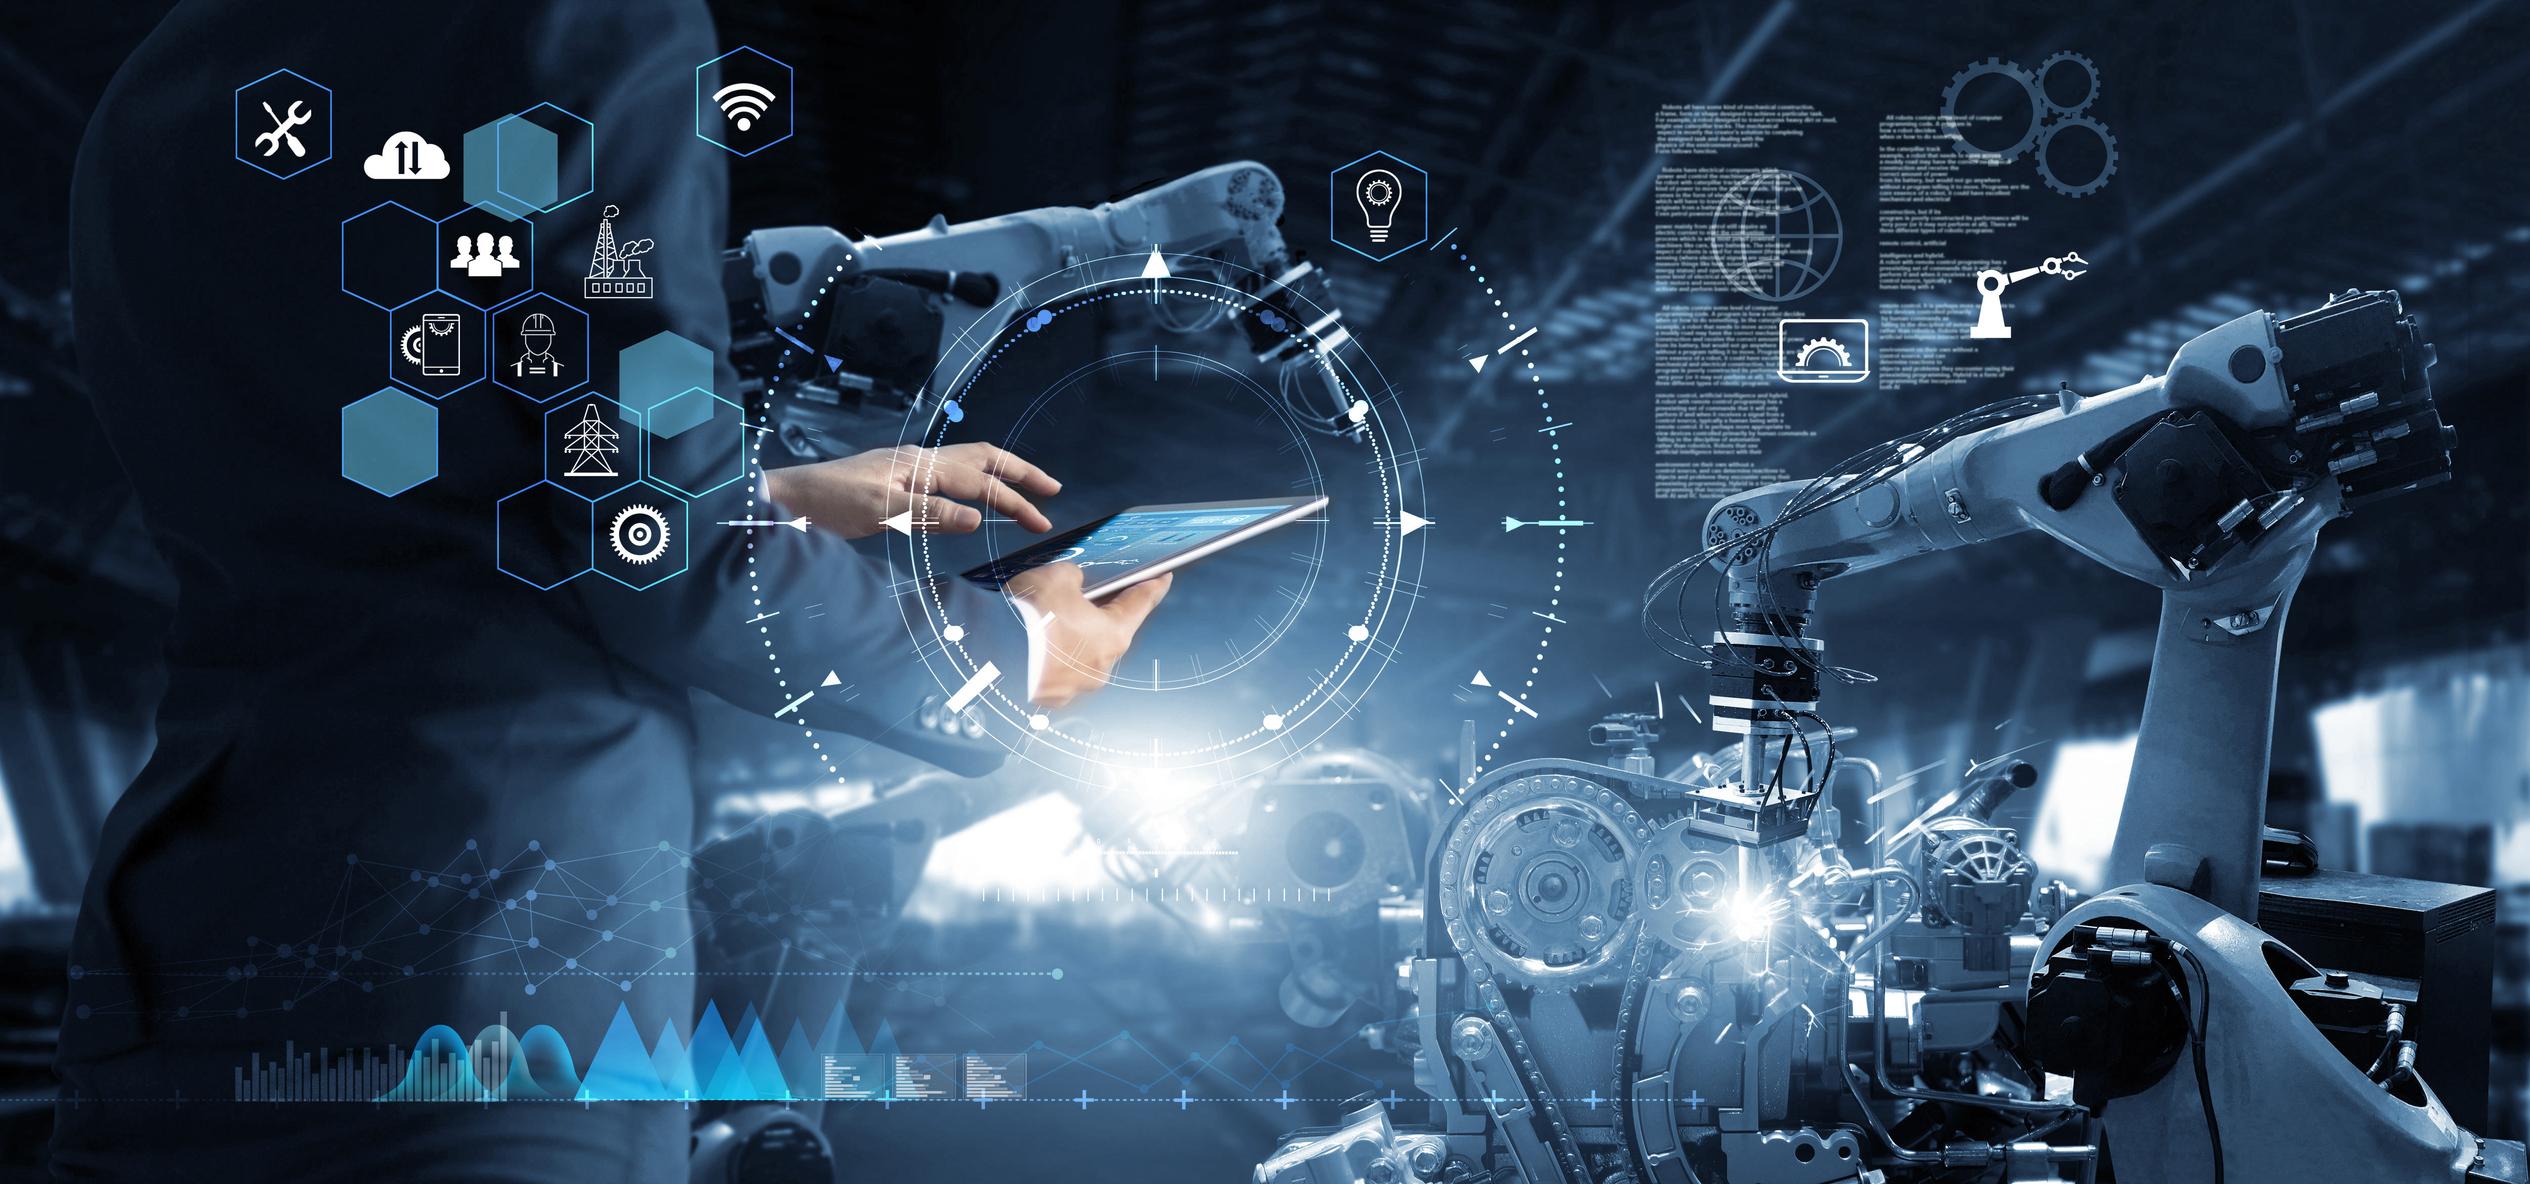 Sourceman International Industrial Electronics Manufacturer